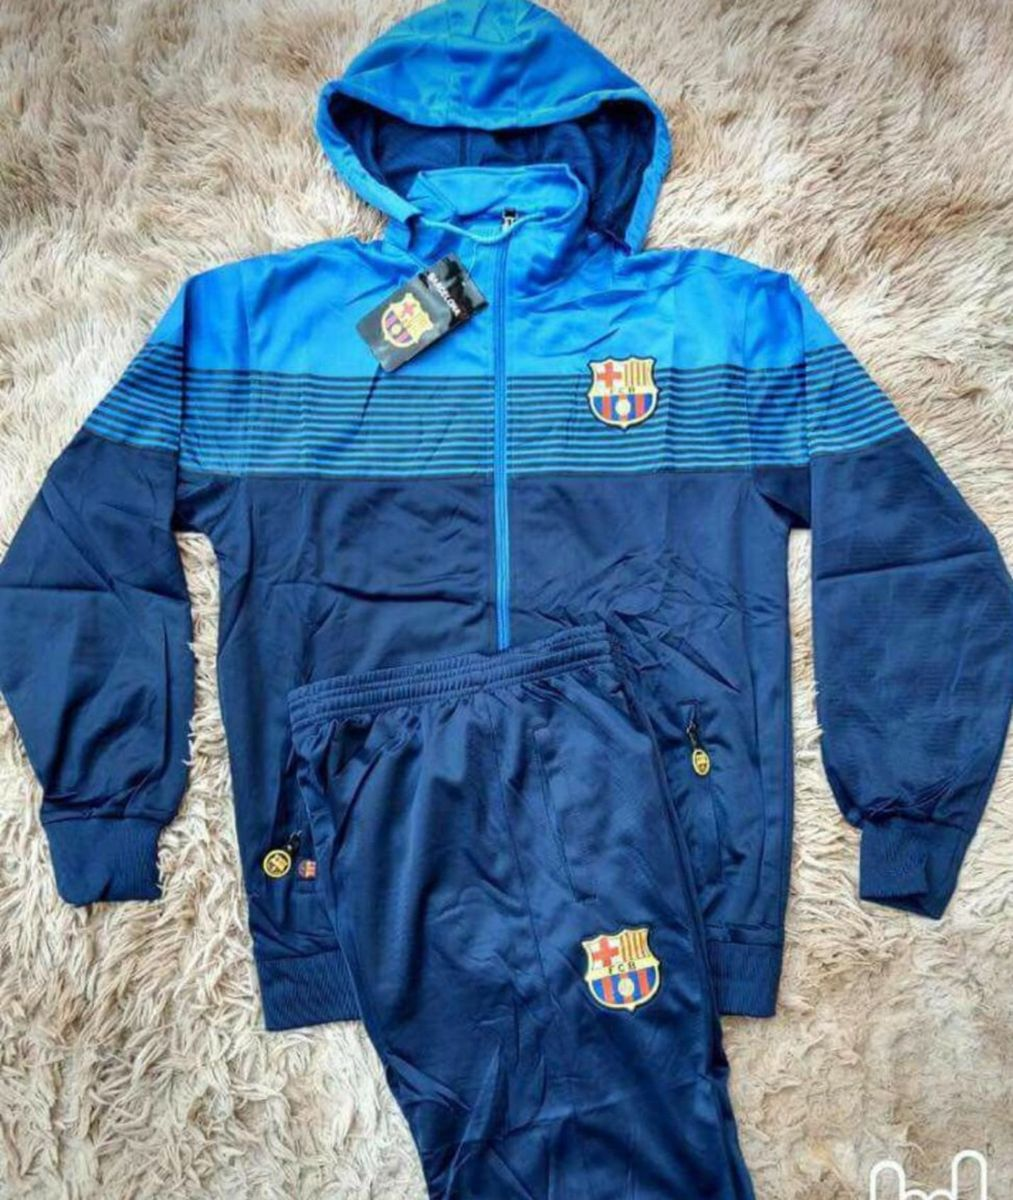 d395ff4a50051 conjunto barcelona calca + blusa azul - casacos sem marca